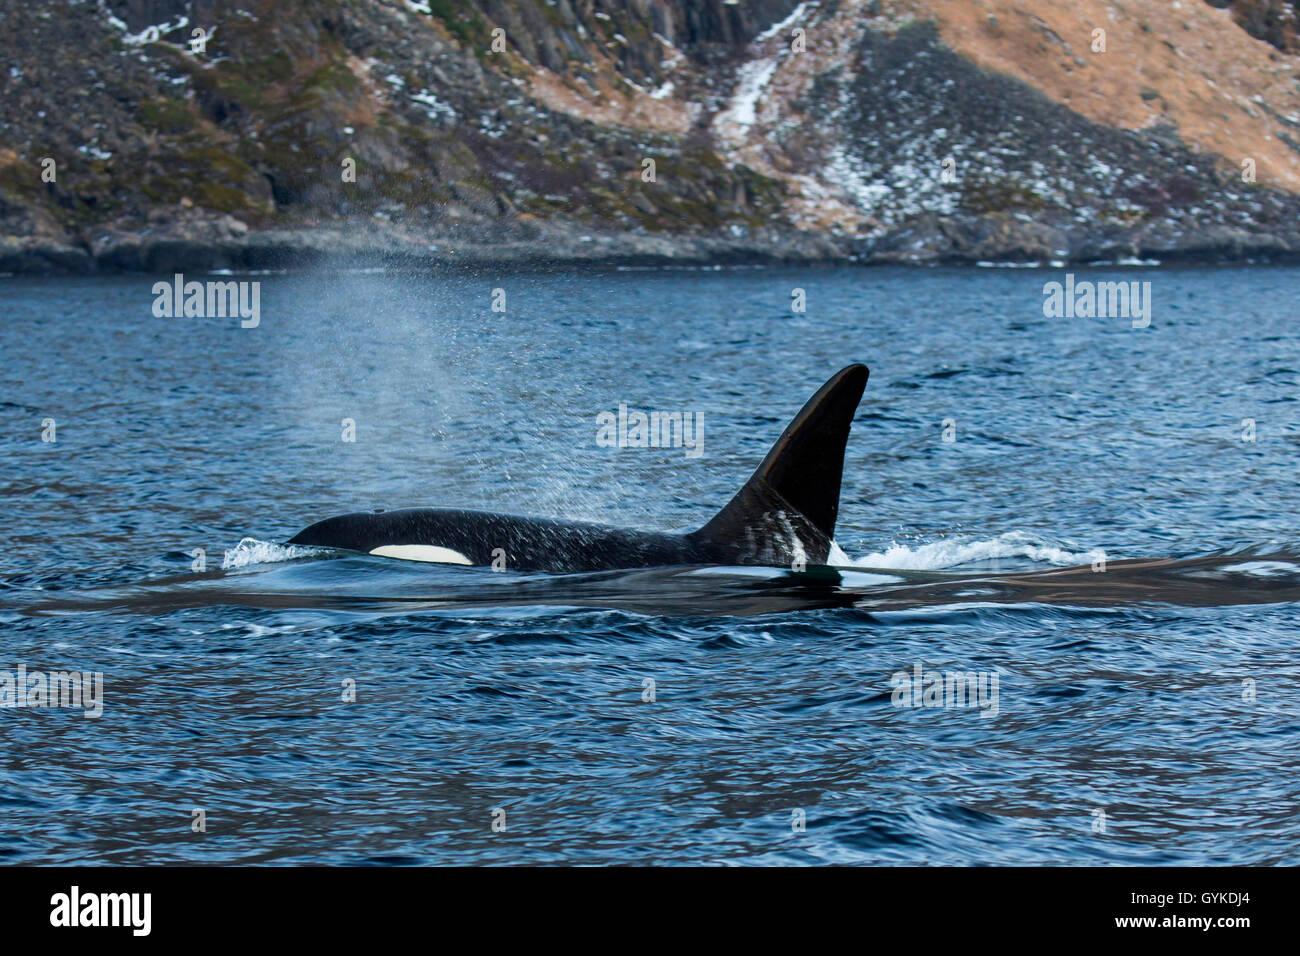 Schwertwal, Killerwal, Orca (Orcinus Orca), Ausatmender Grosser Bulle  Schwimmt In Ufernaehe